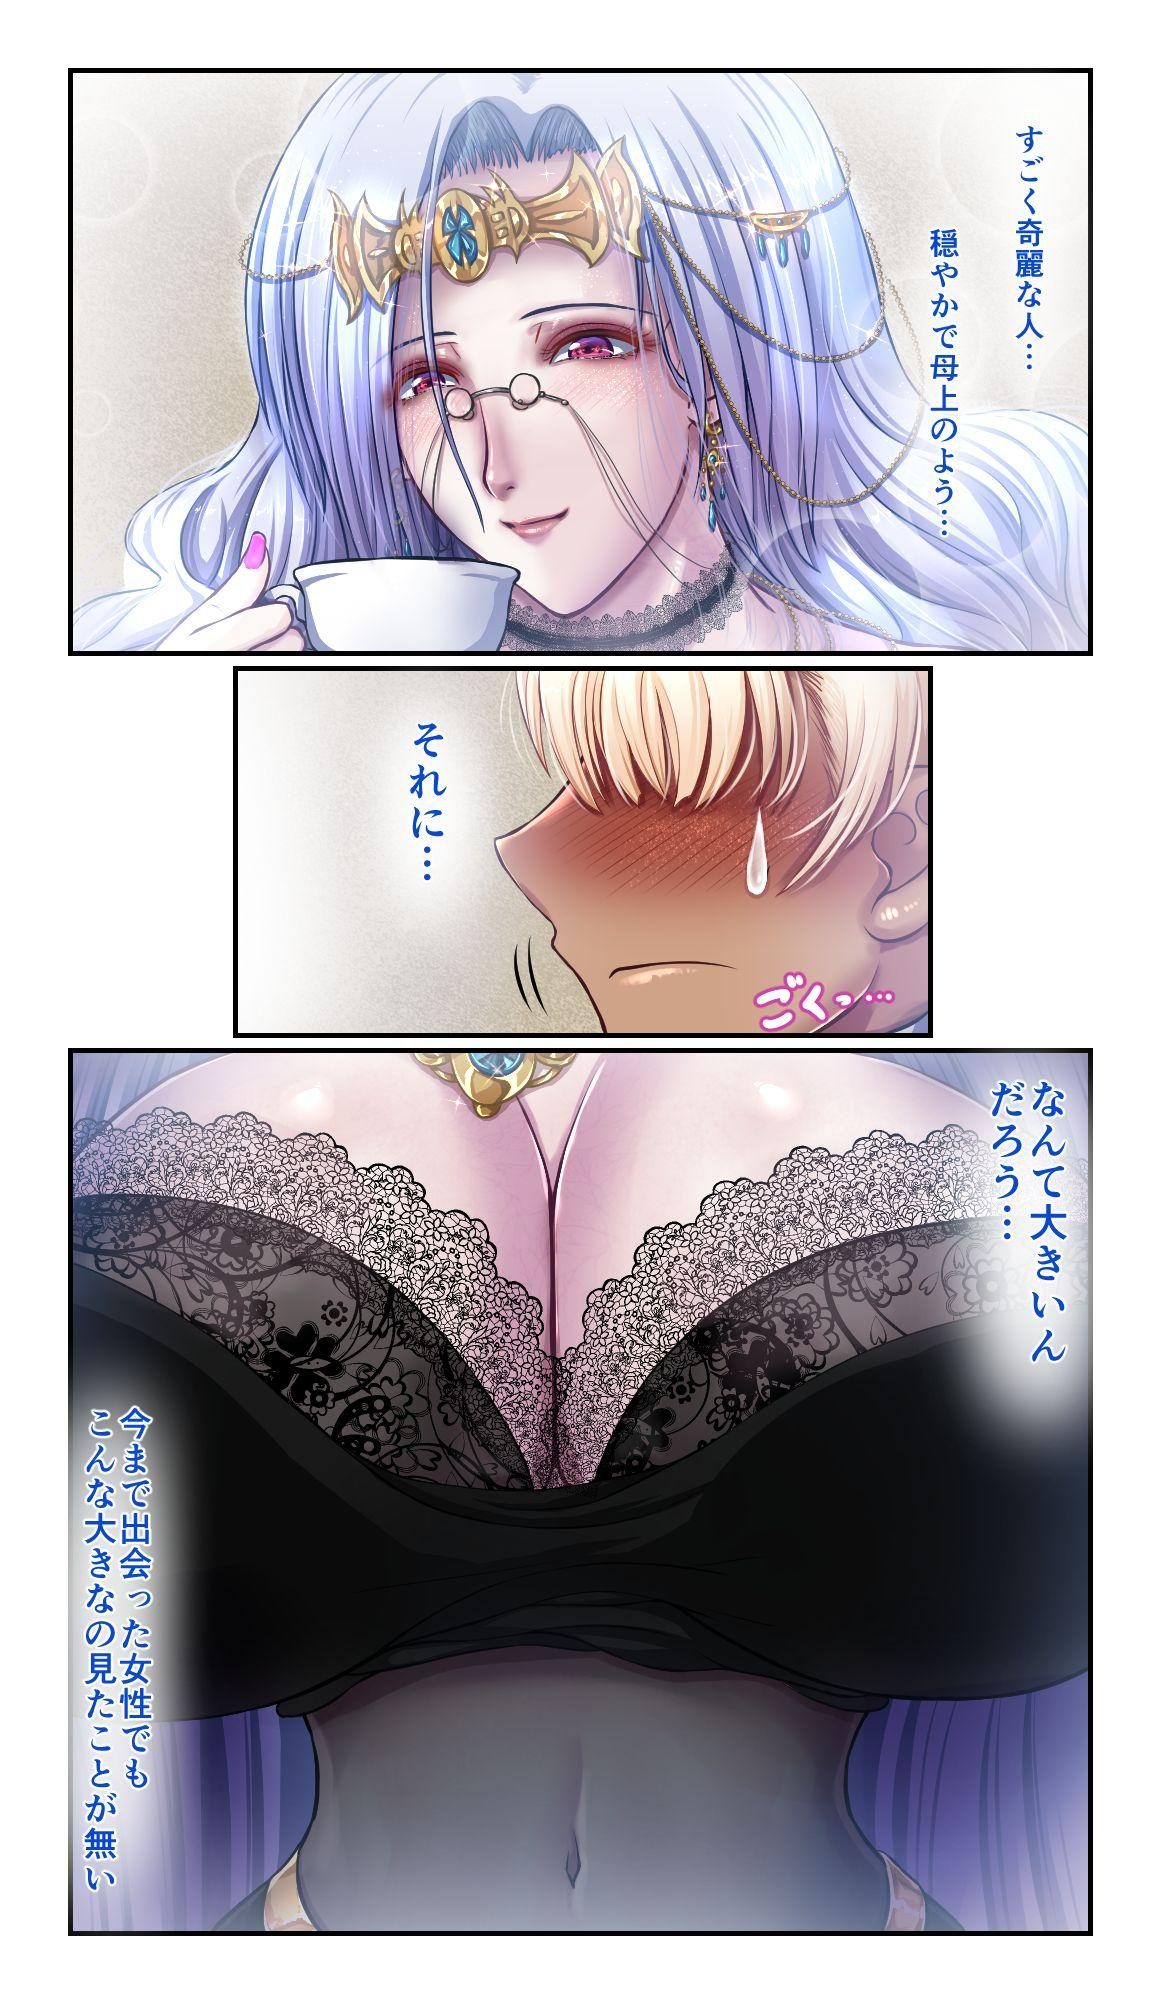 SweetEdda vol. 5 Nyuuma Hen Hitokui Chibusa no Mamelon 5